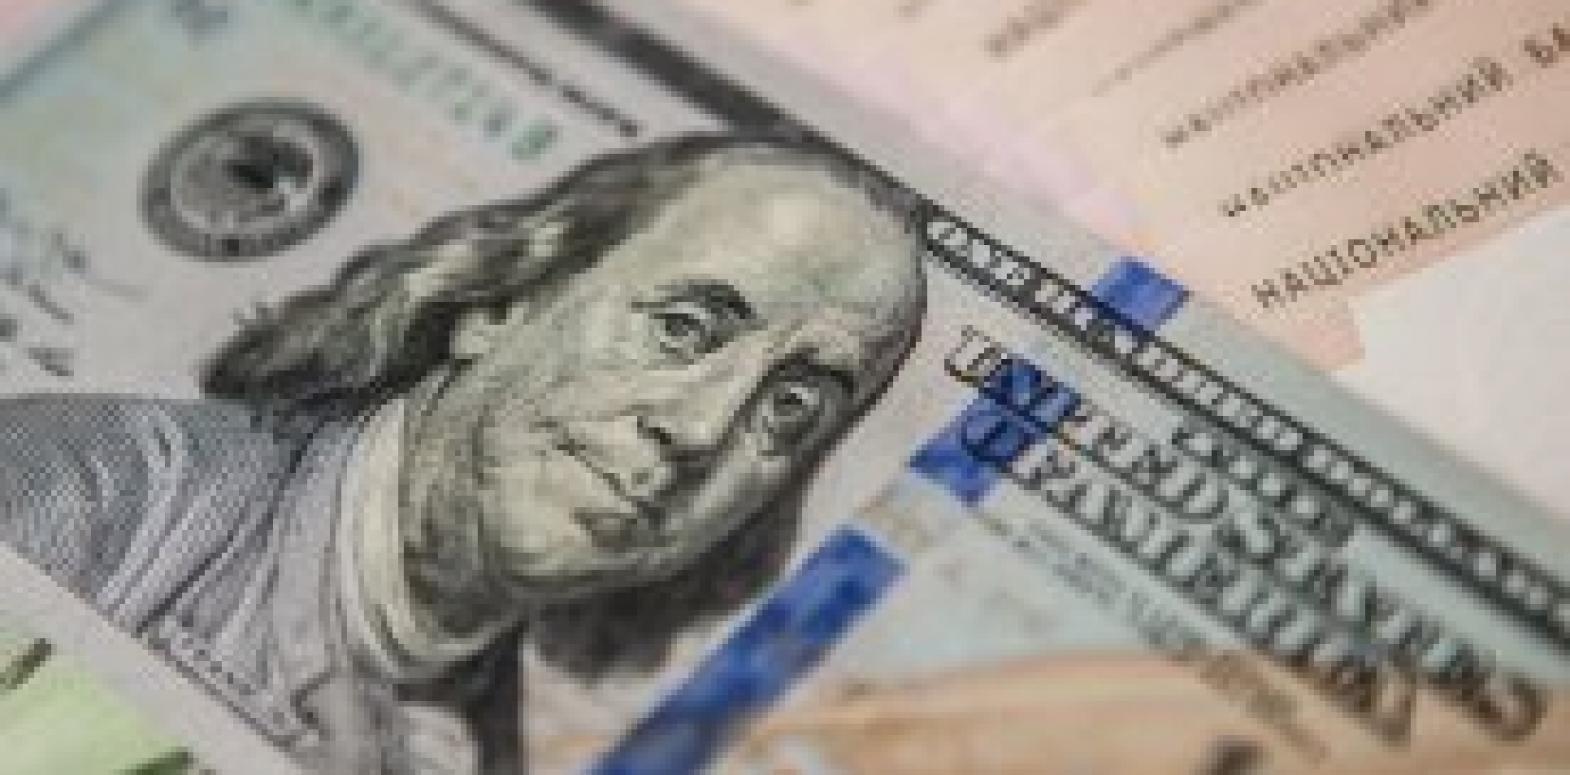 Курс НБУ на 25 февраля: доллар - 24,49 грн, евро - 26,51 грн